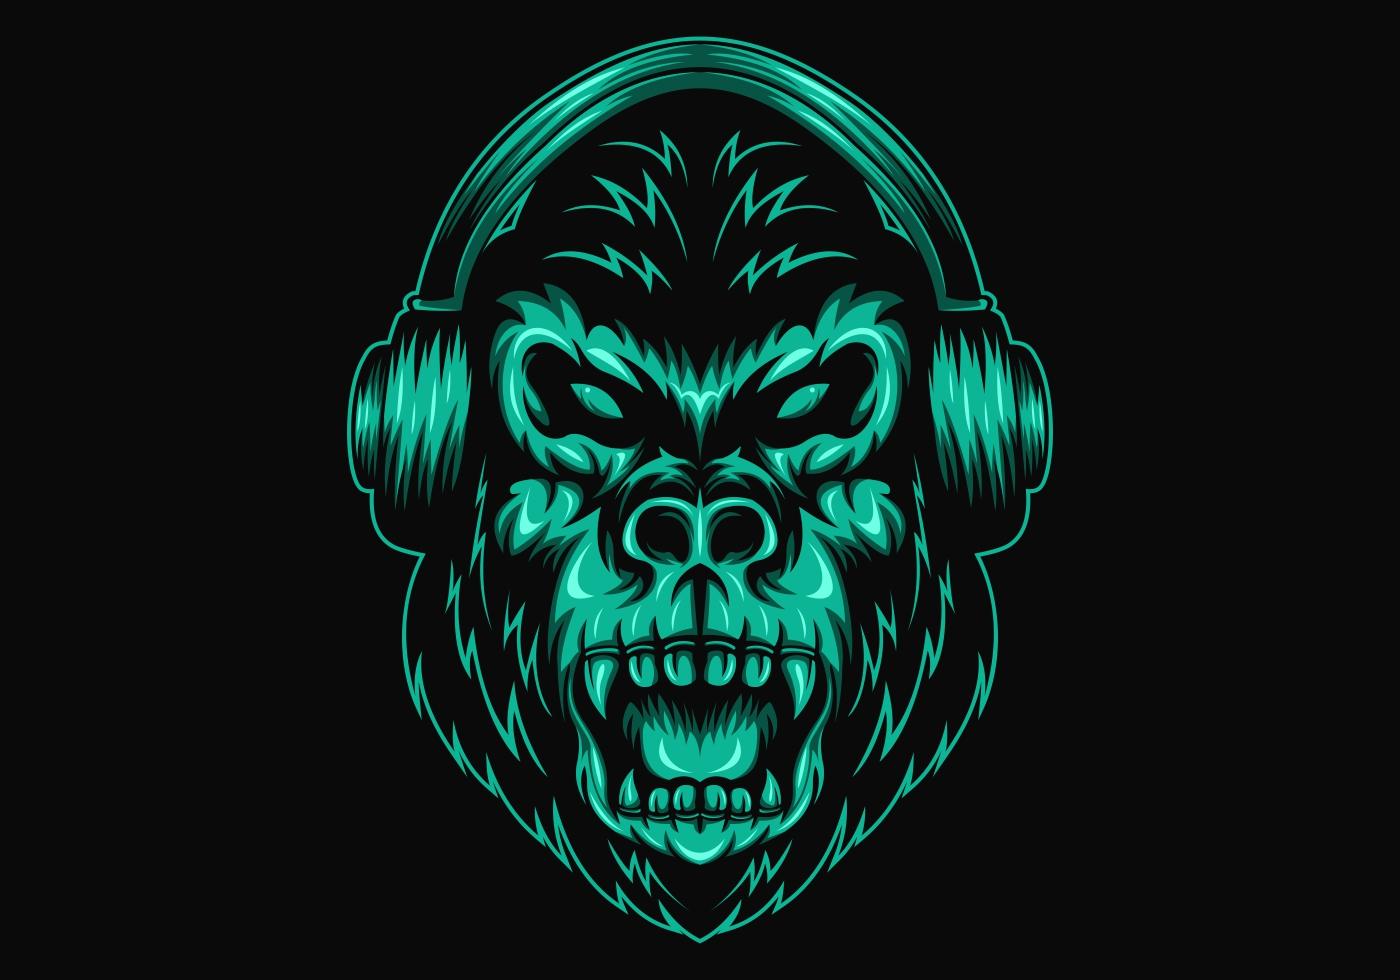 3 Monos Sabios Tatuajes auriculares gorila - descargar vectores gratis, illustrator